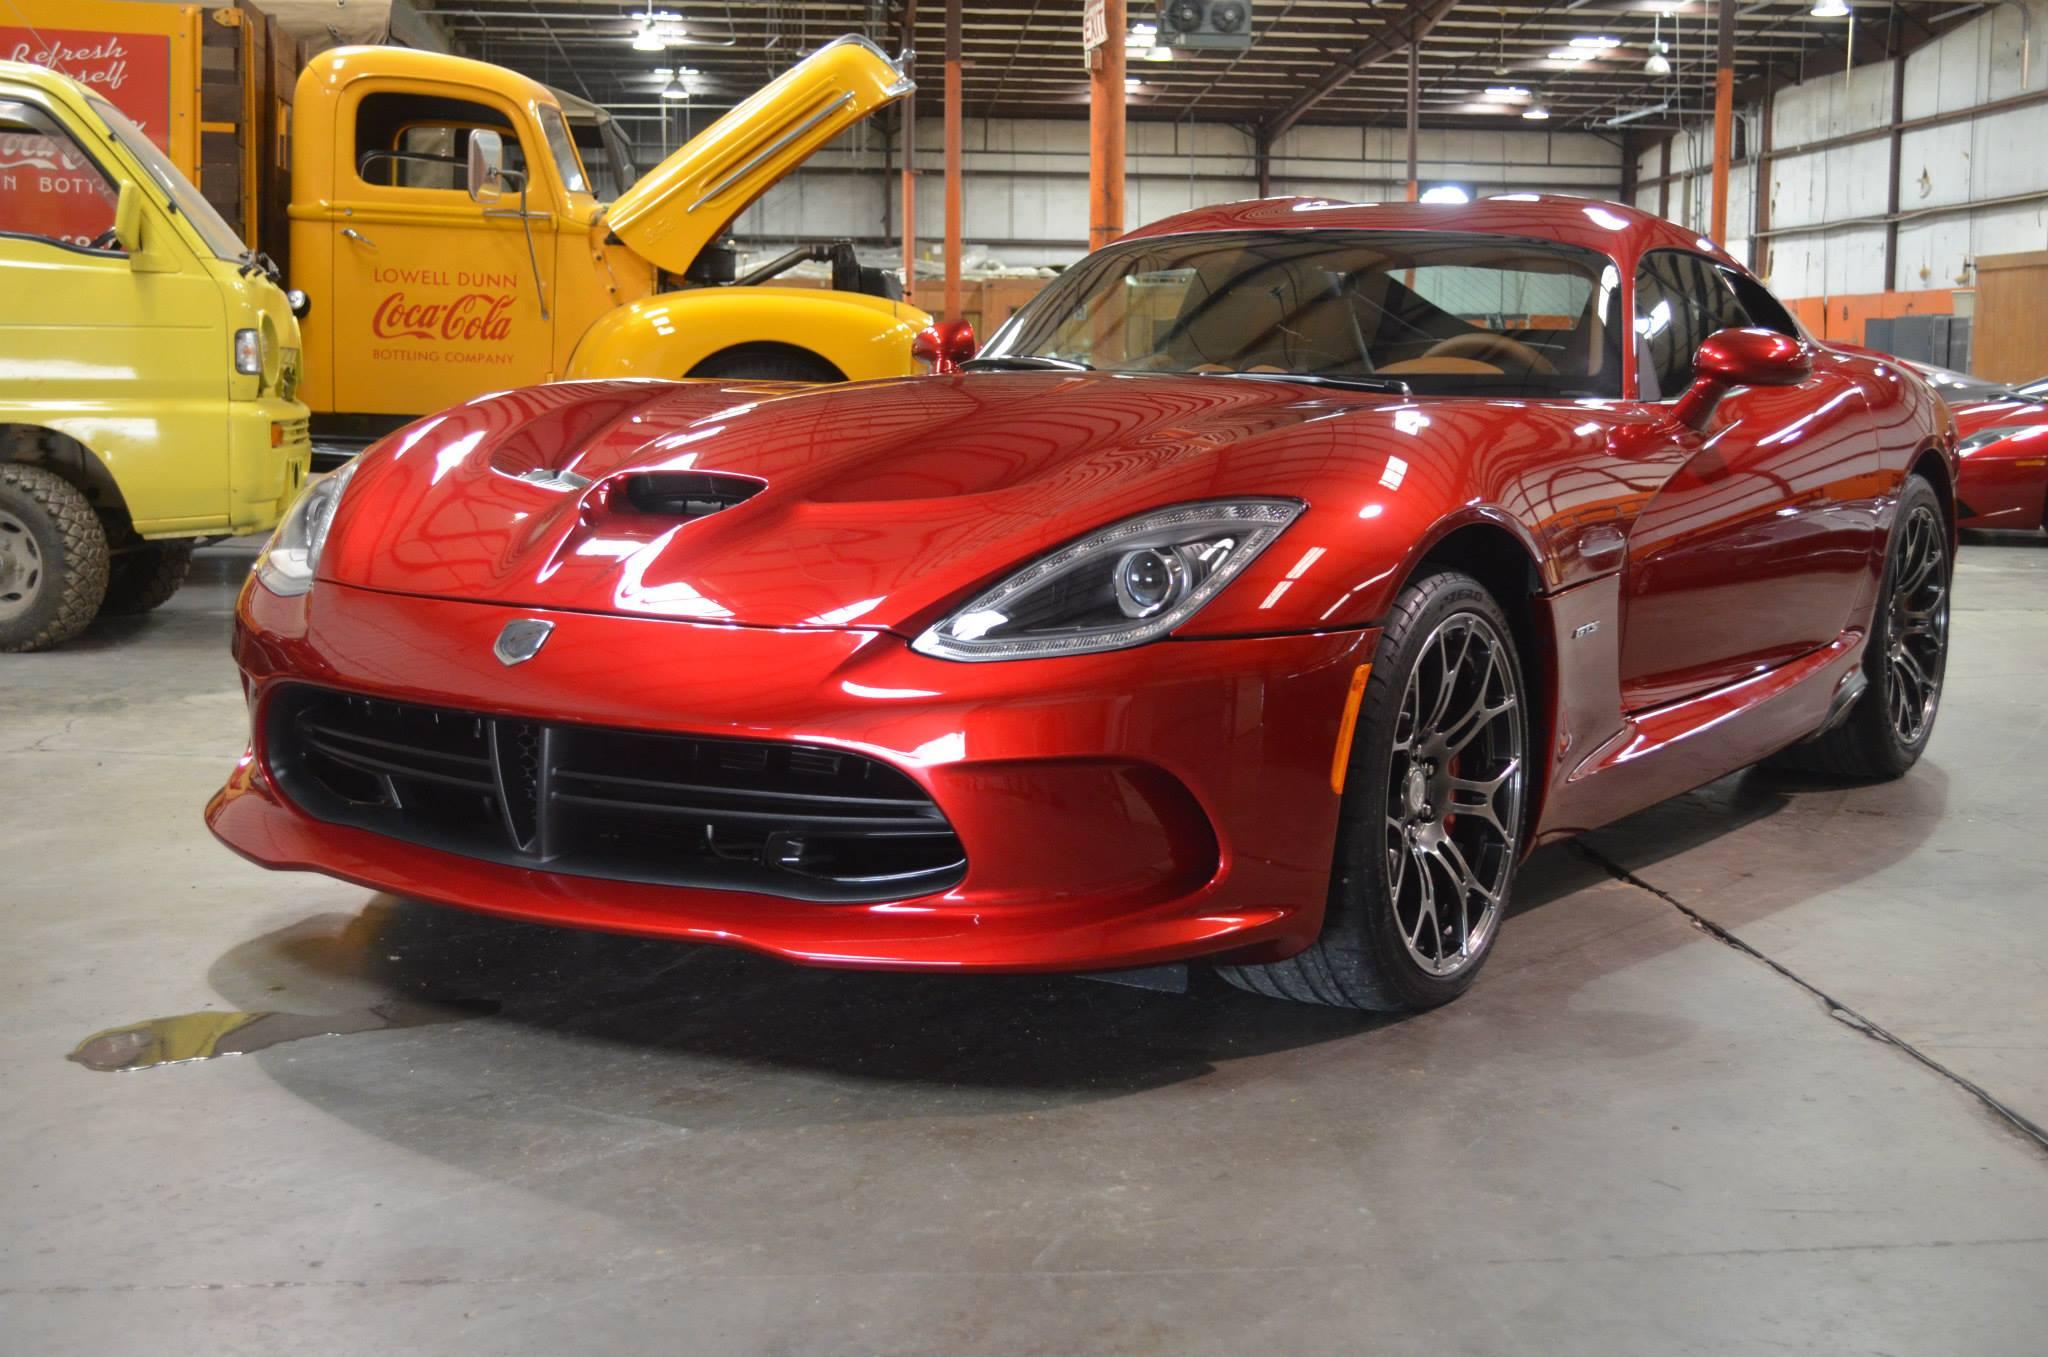 Dodge Viper GTS: Track Pack PPF